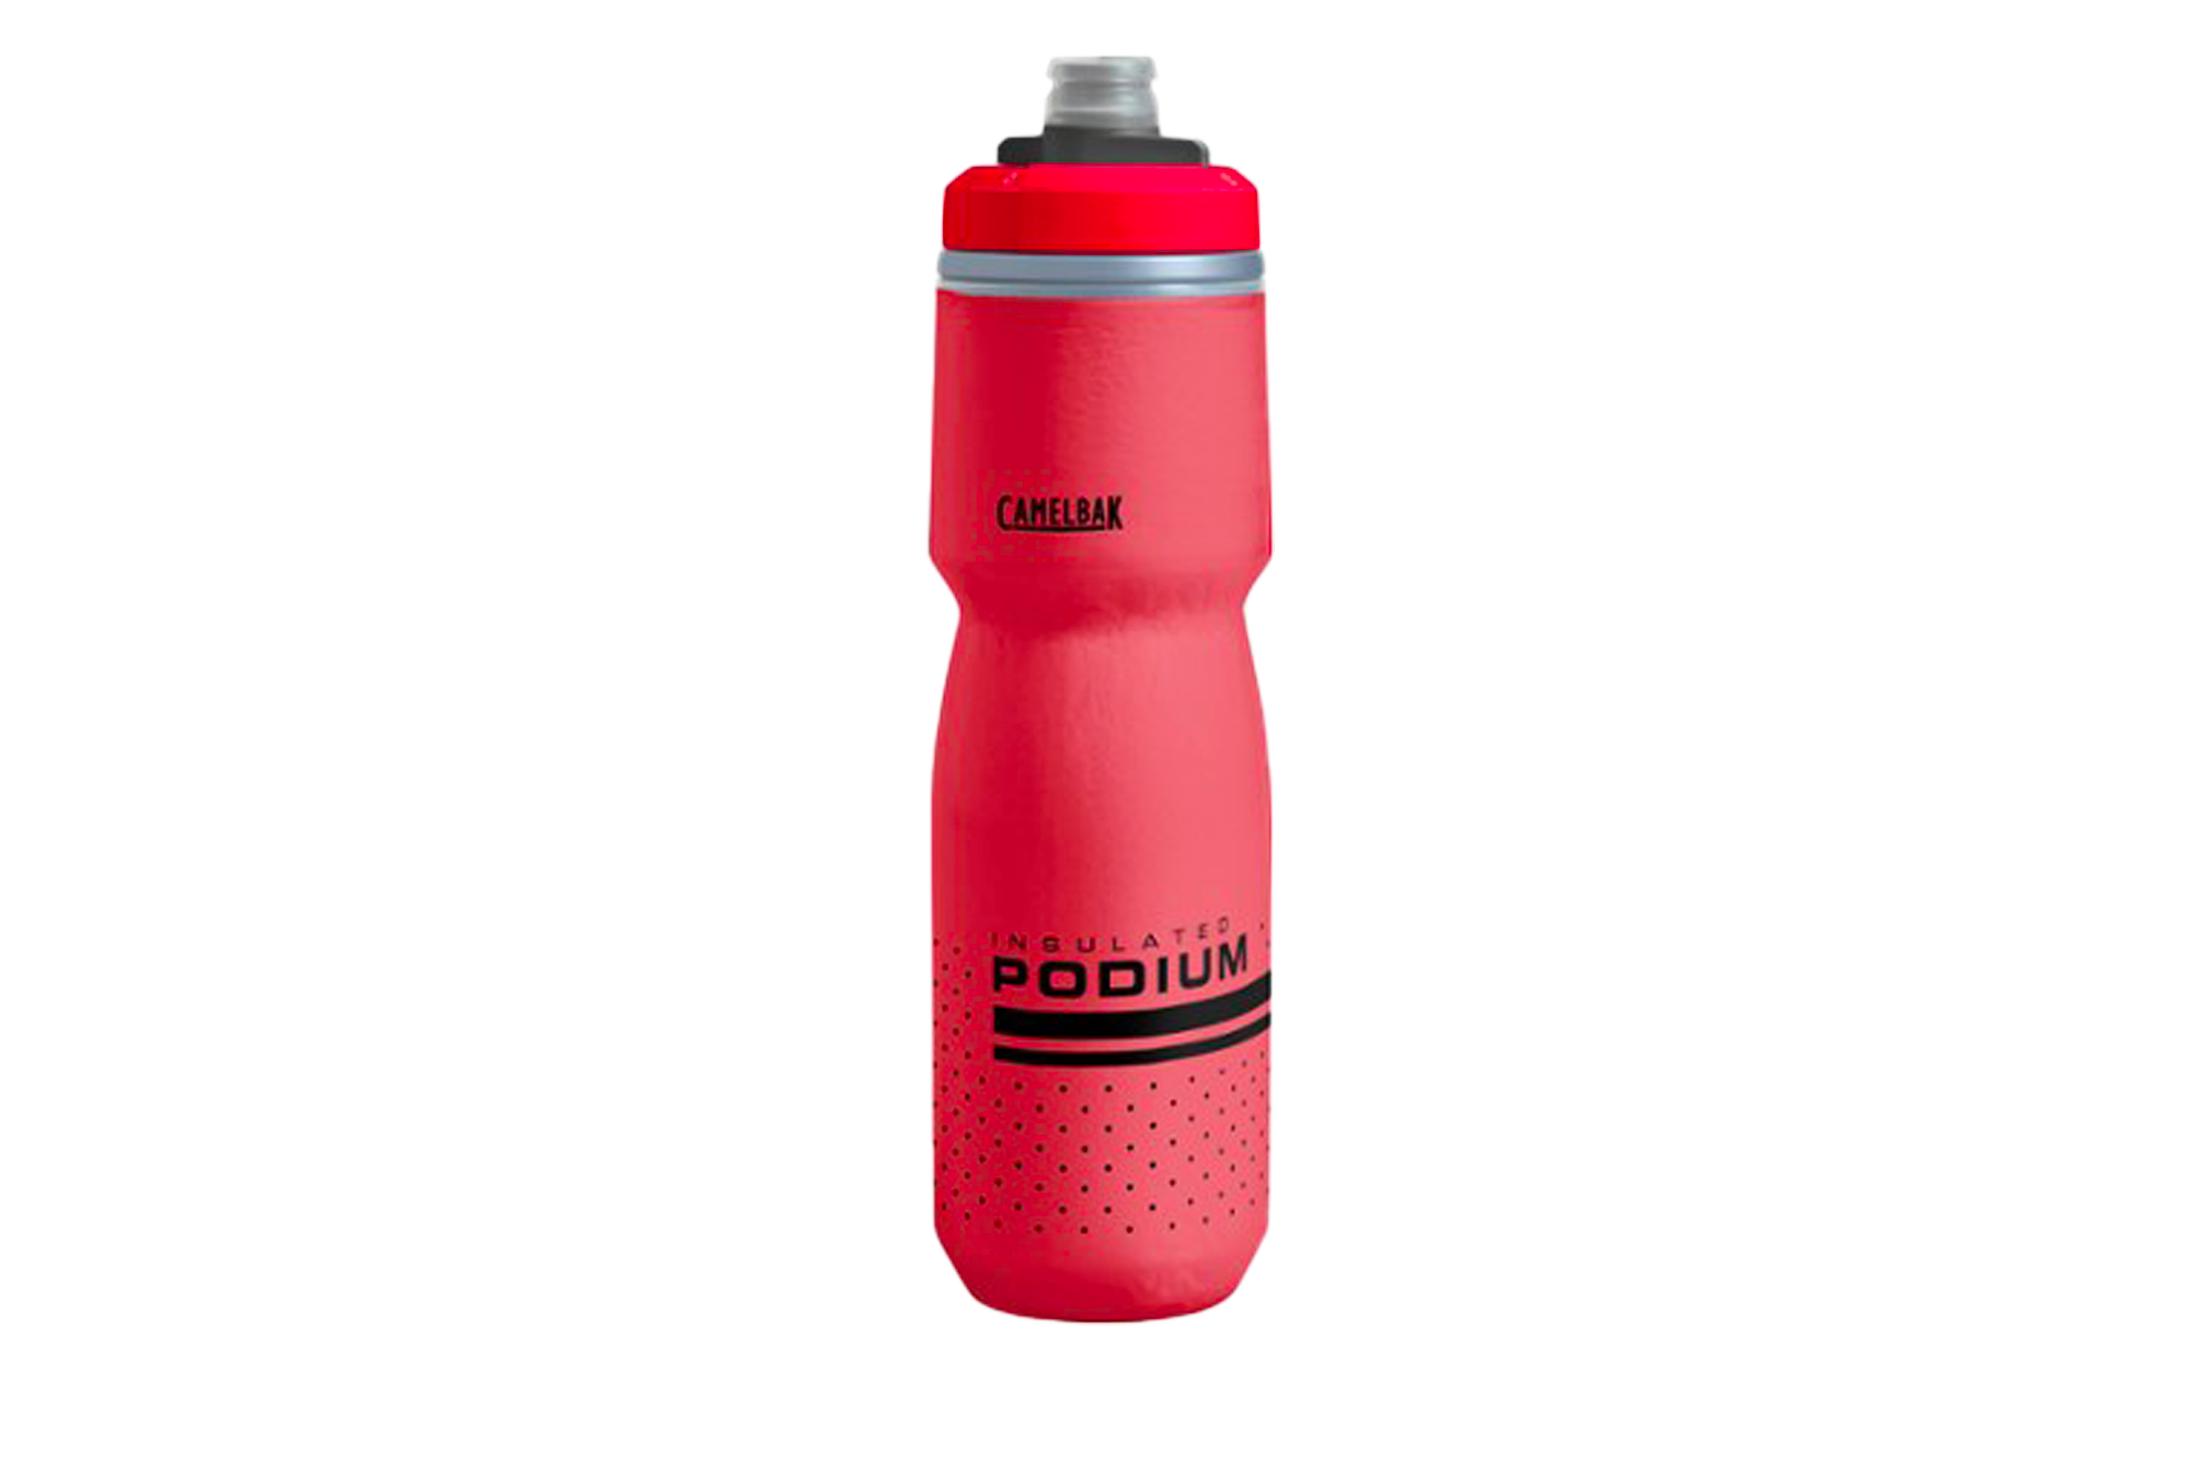 CamelBak Podium Chill Insulated Water Bottle - 24 fl. oz